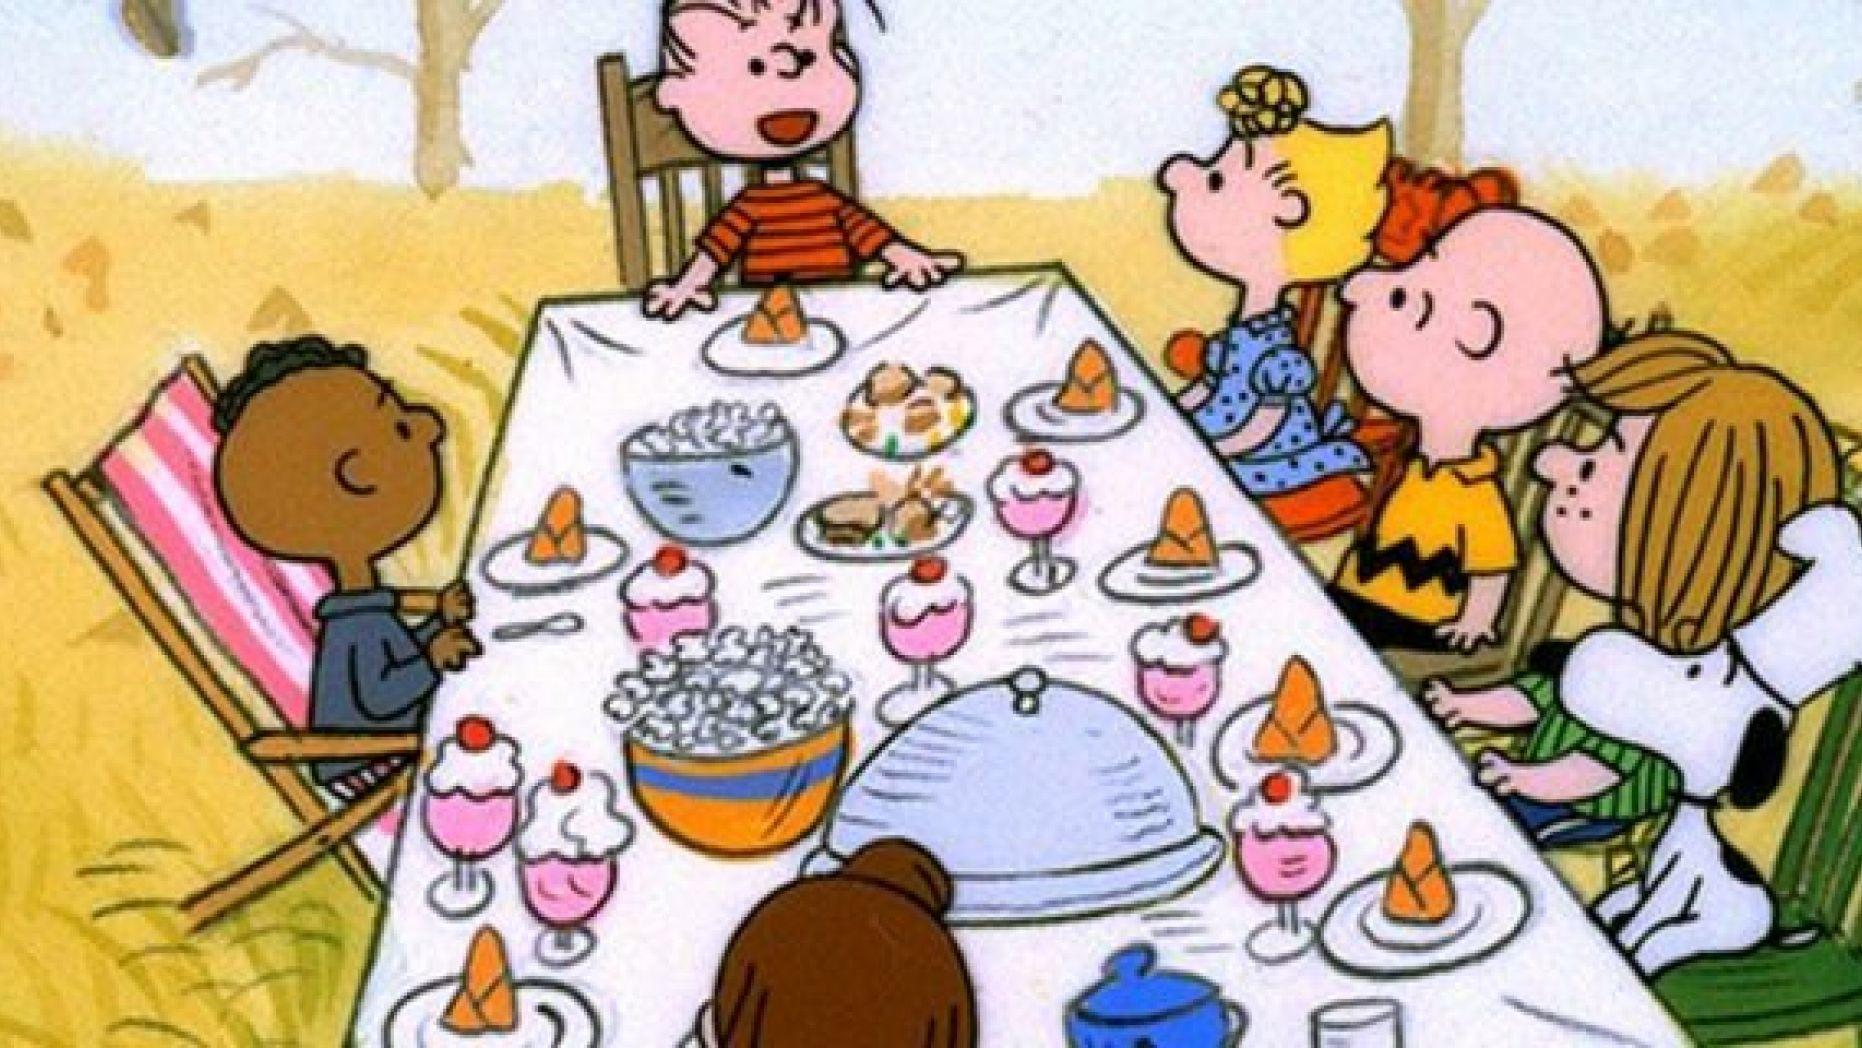 Feast clipart peanuts. Charlie brown cartoon labelled